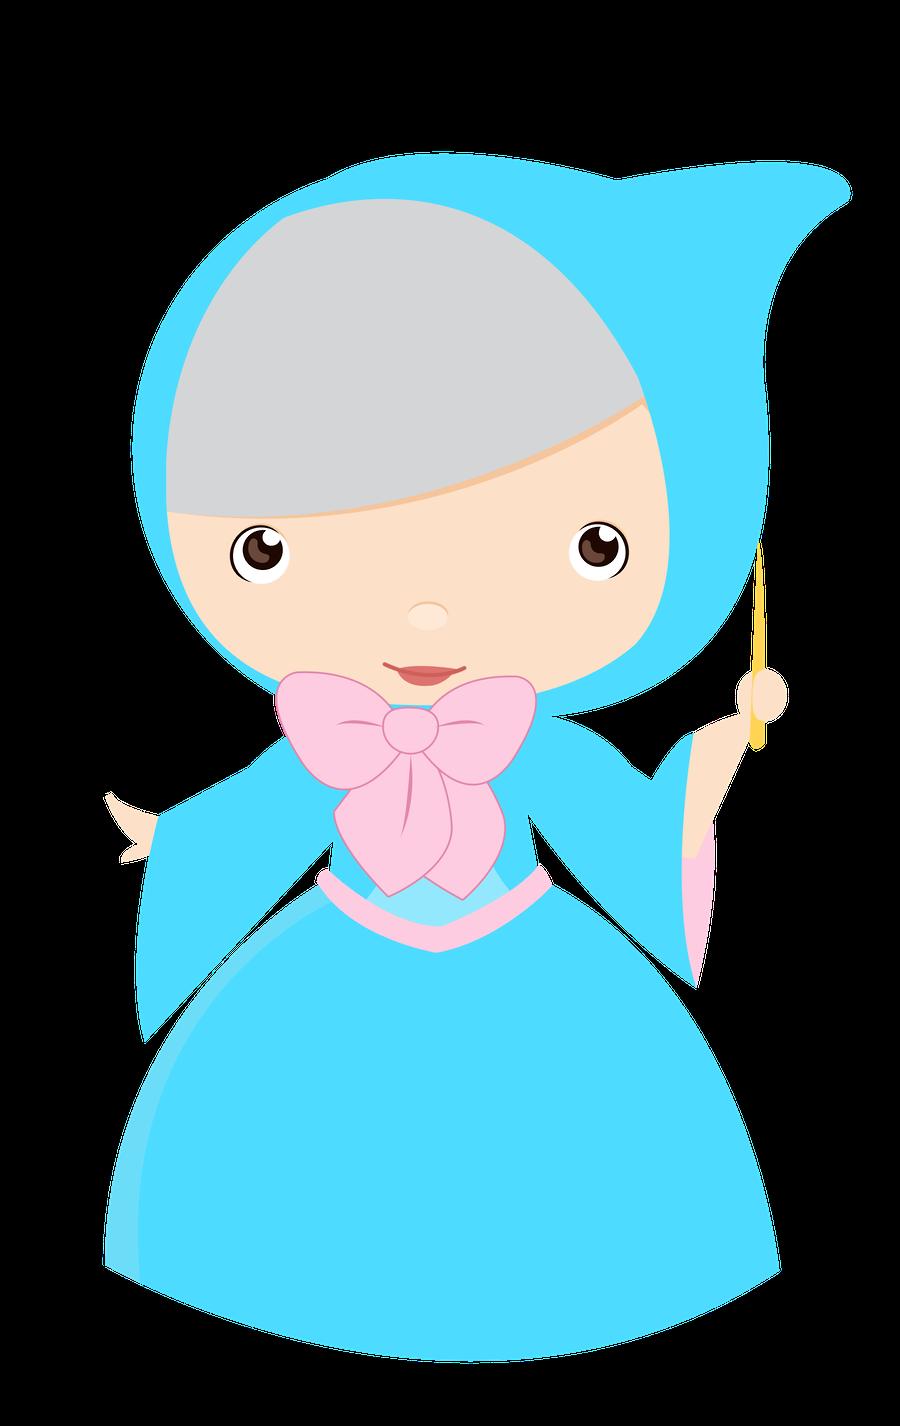 Cinderella Baby Clip Art Fada Madrinha Da Cinderela Fada Madrinha Cinderela Feltro